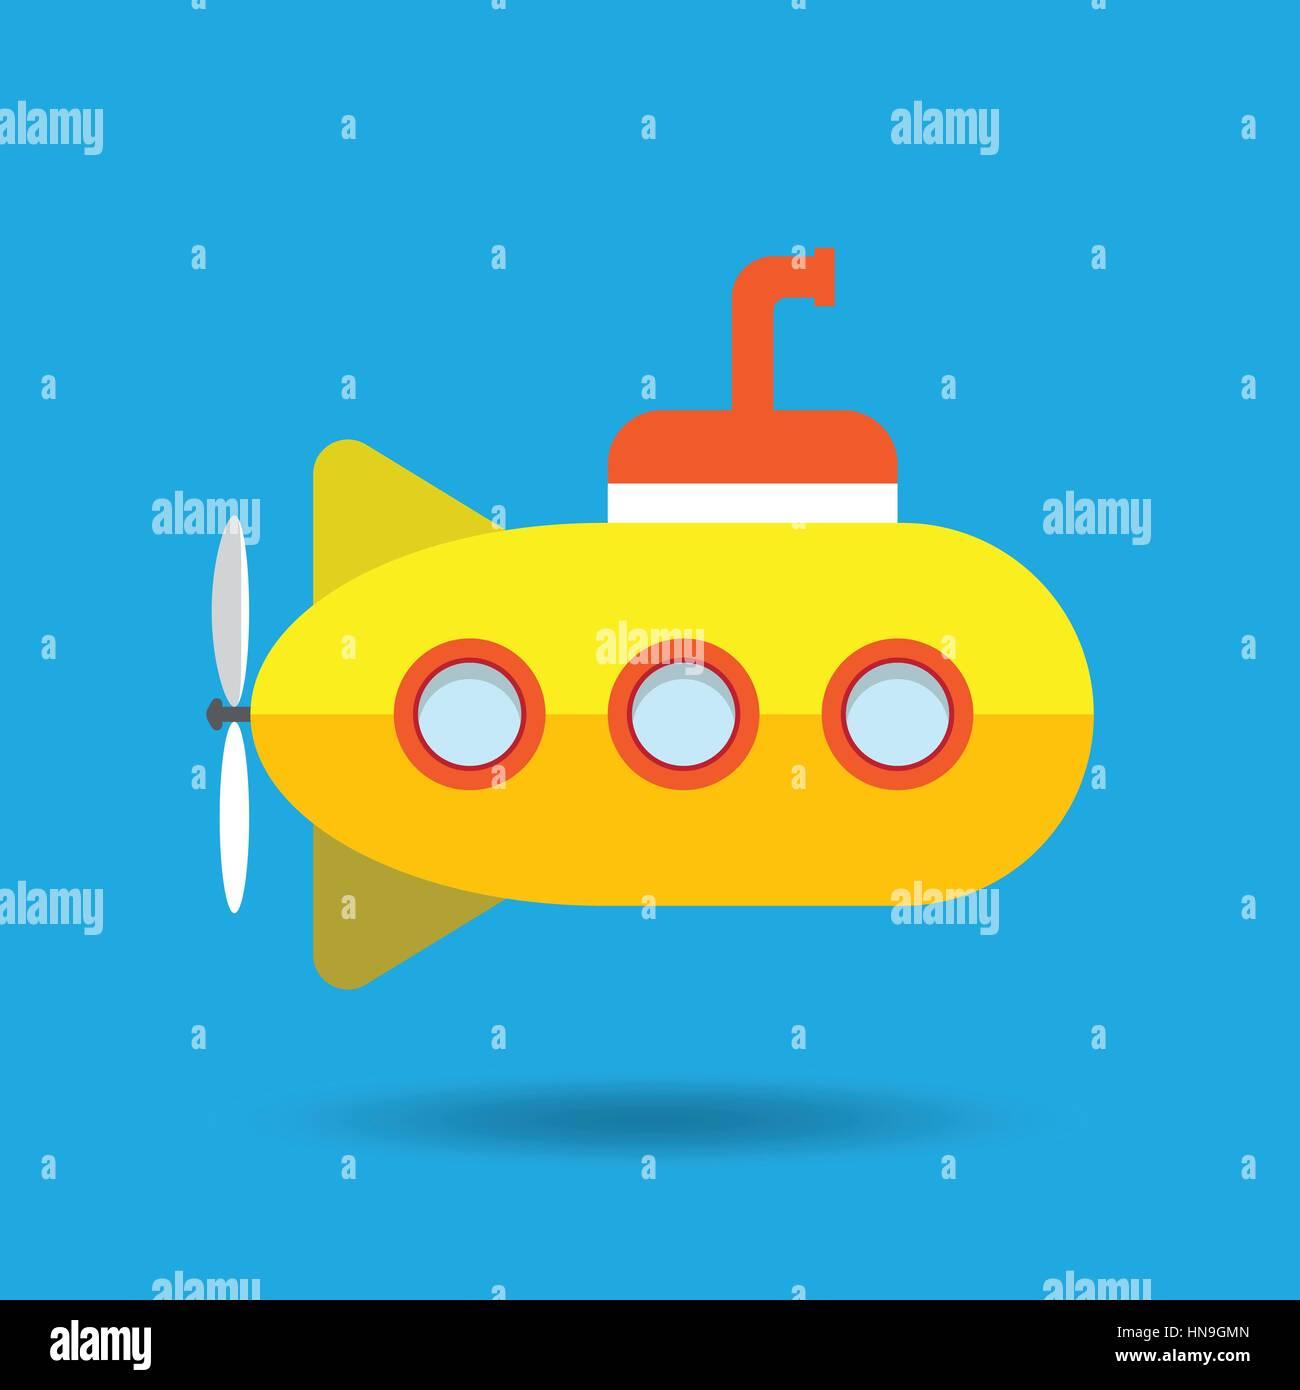 Yellow Submarine Vector Illustration - Stock Image